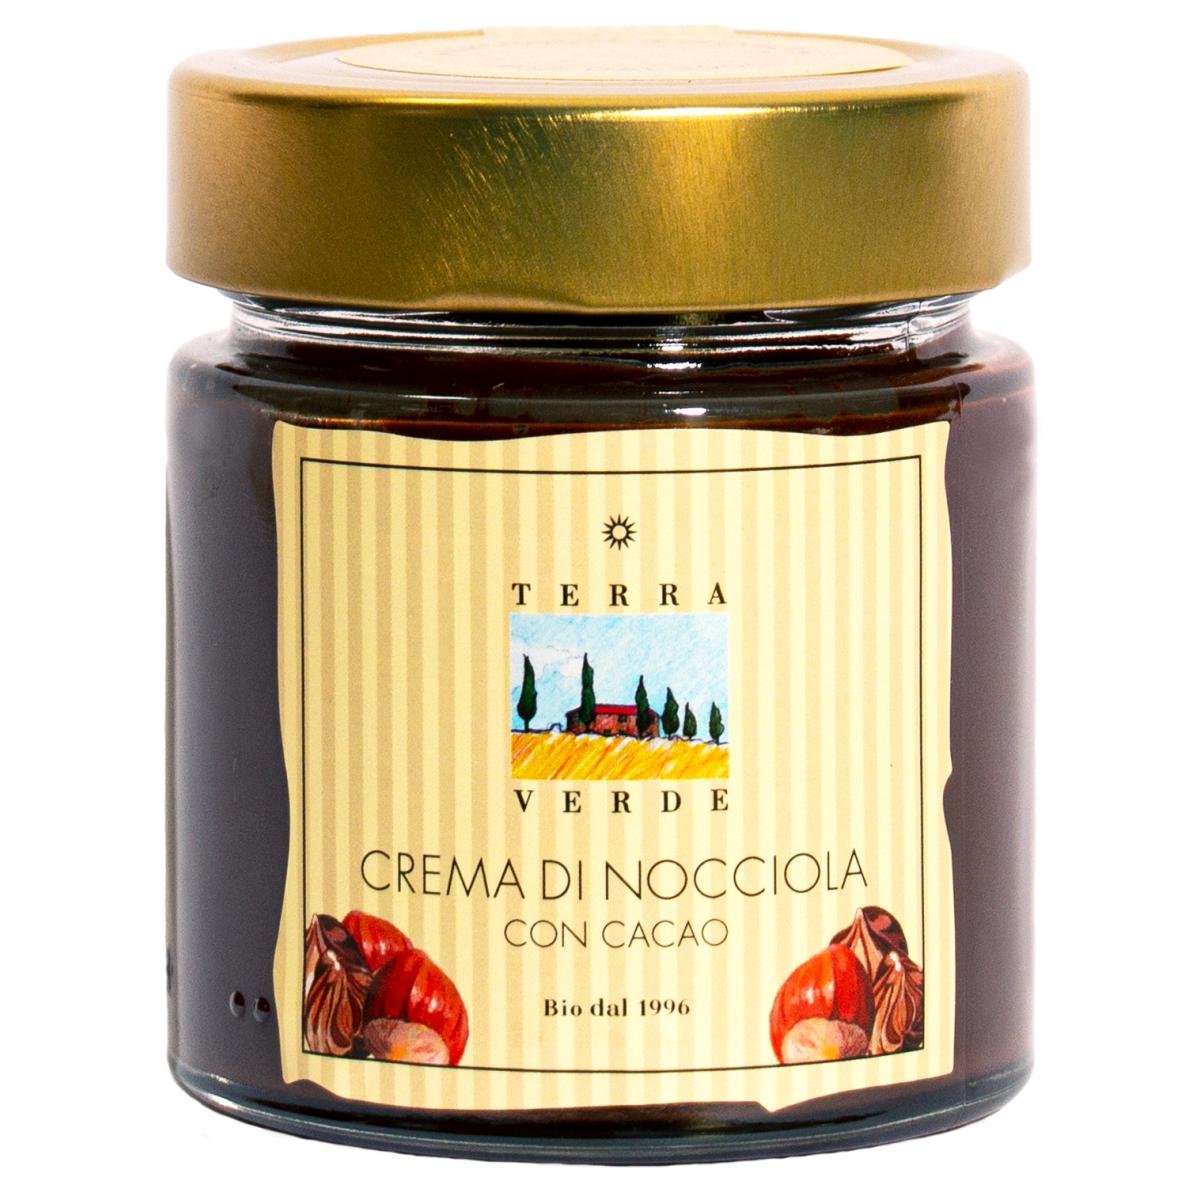 Crema di nocciola, Haselnuss-Kakao-Creme